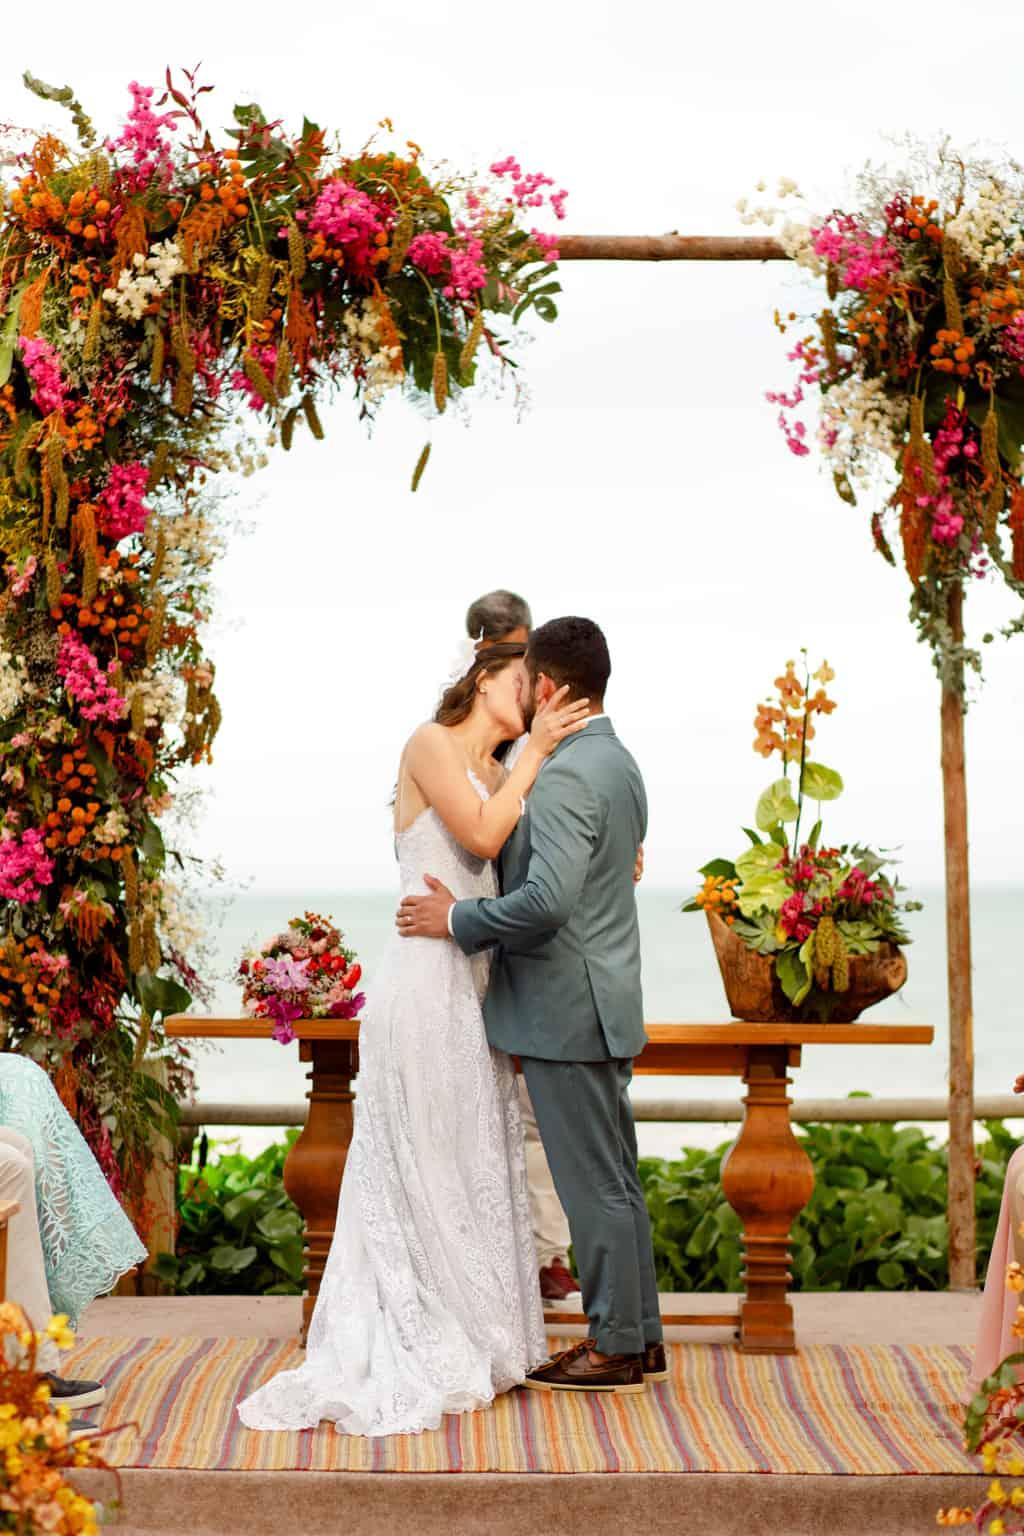 Casamento-Emanuelle-e-Alysson-Fotografia-Tadeu-Nanó-e-Luca-Antunes115